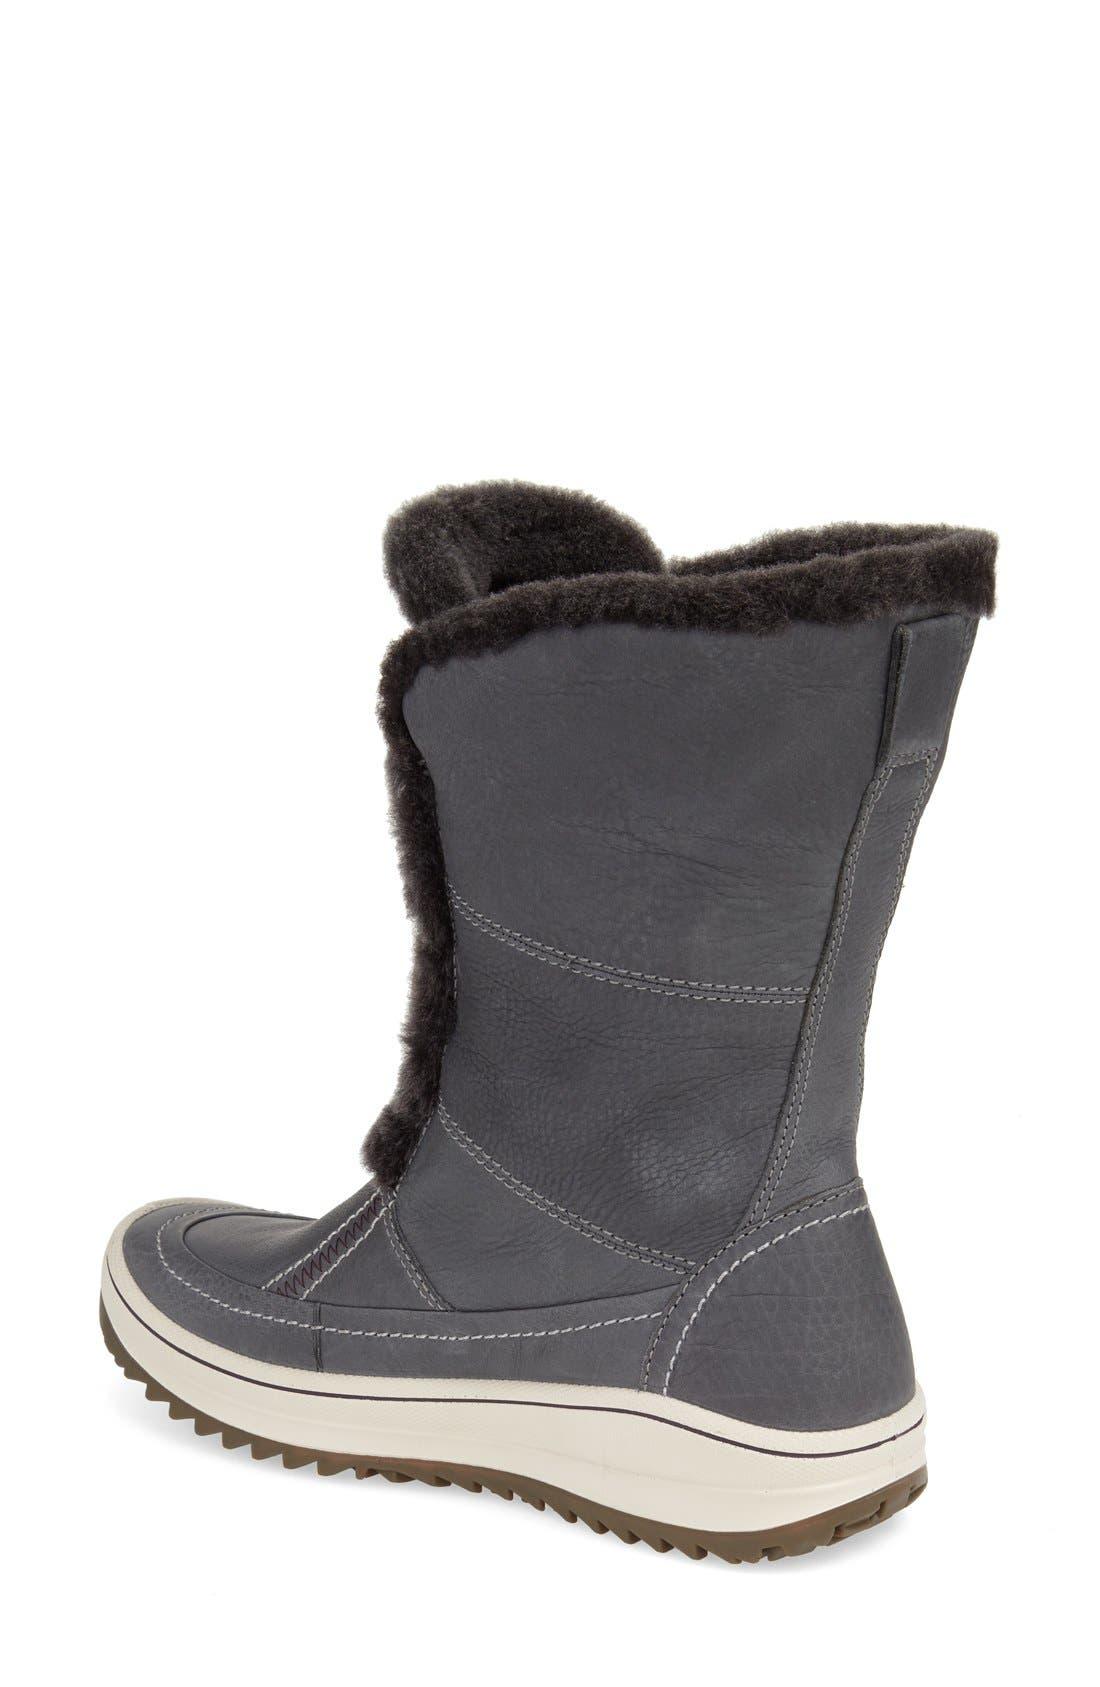 ECCO, 'Trace' Snow Boot, Alternate thumbnail 4, color, 077